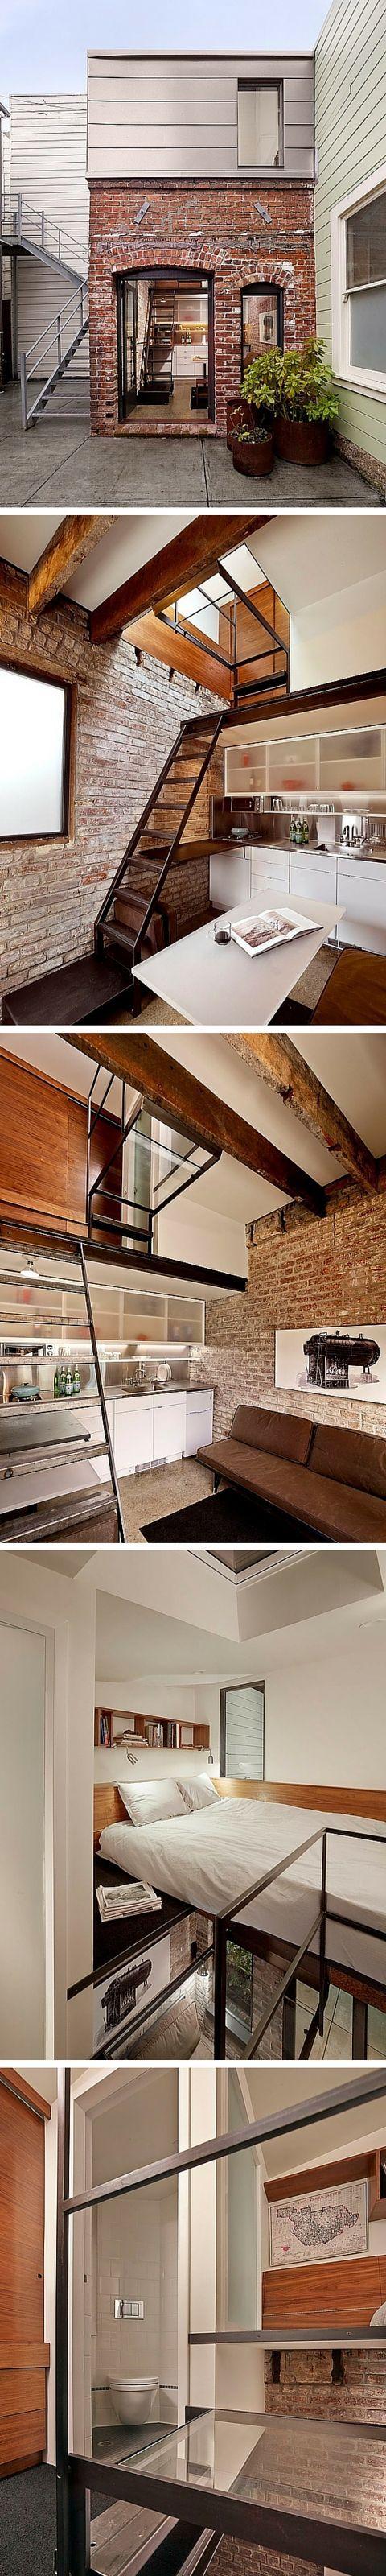 140 best loft living images on pinterest arquitetura home ideas